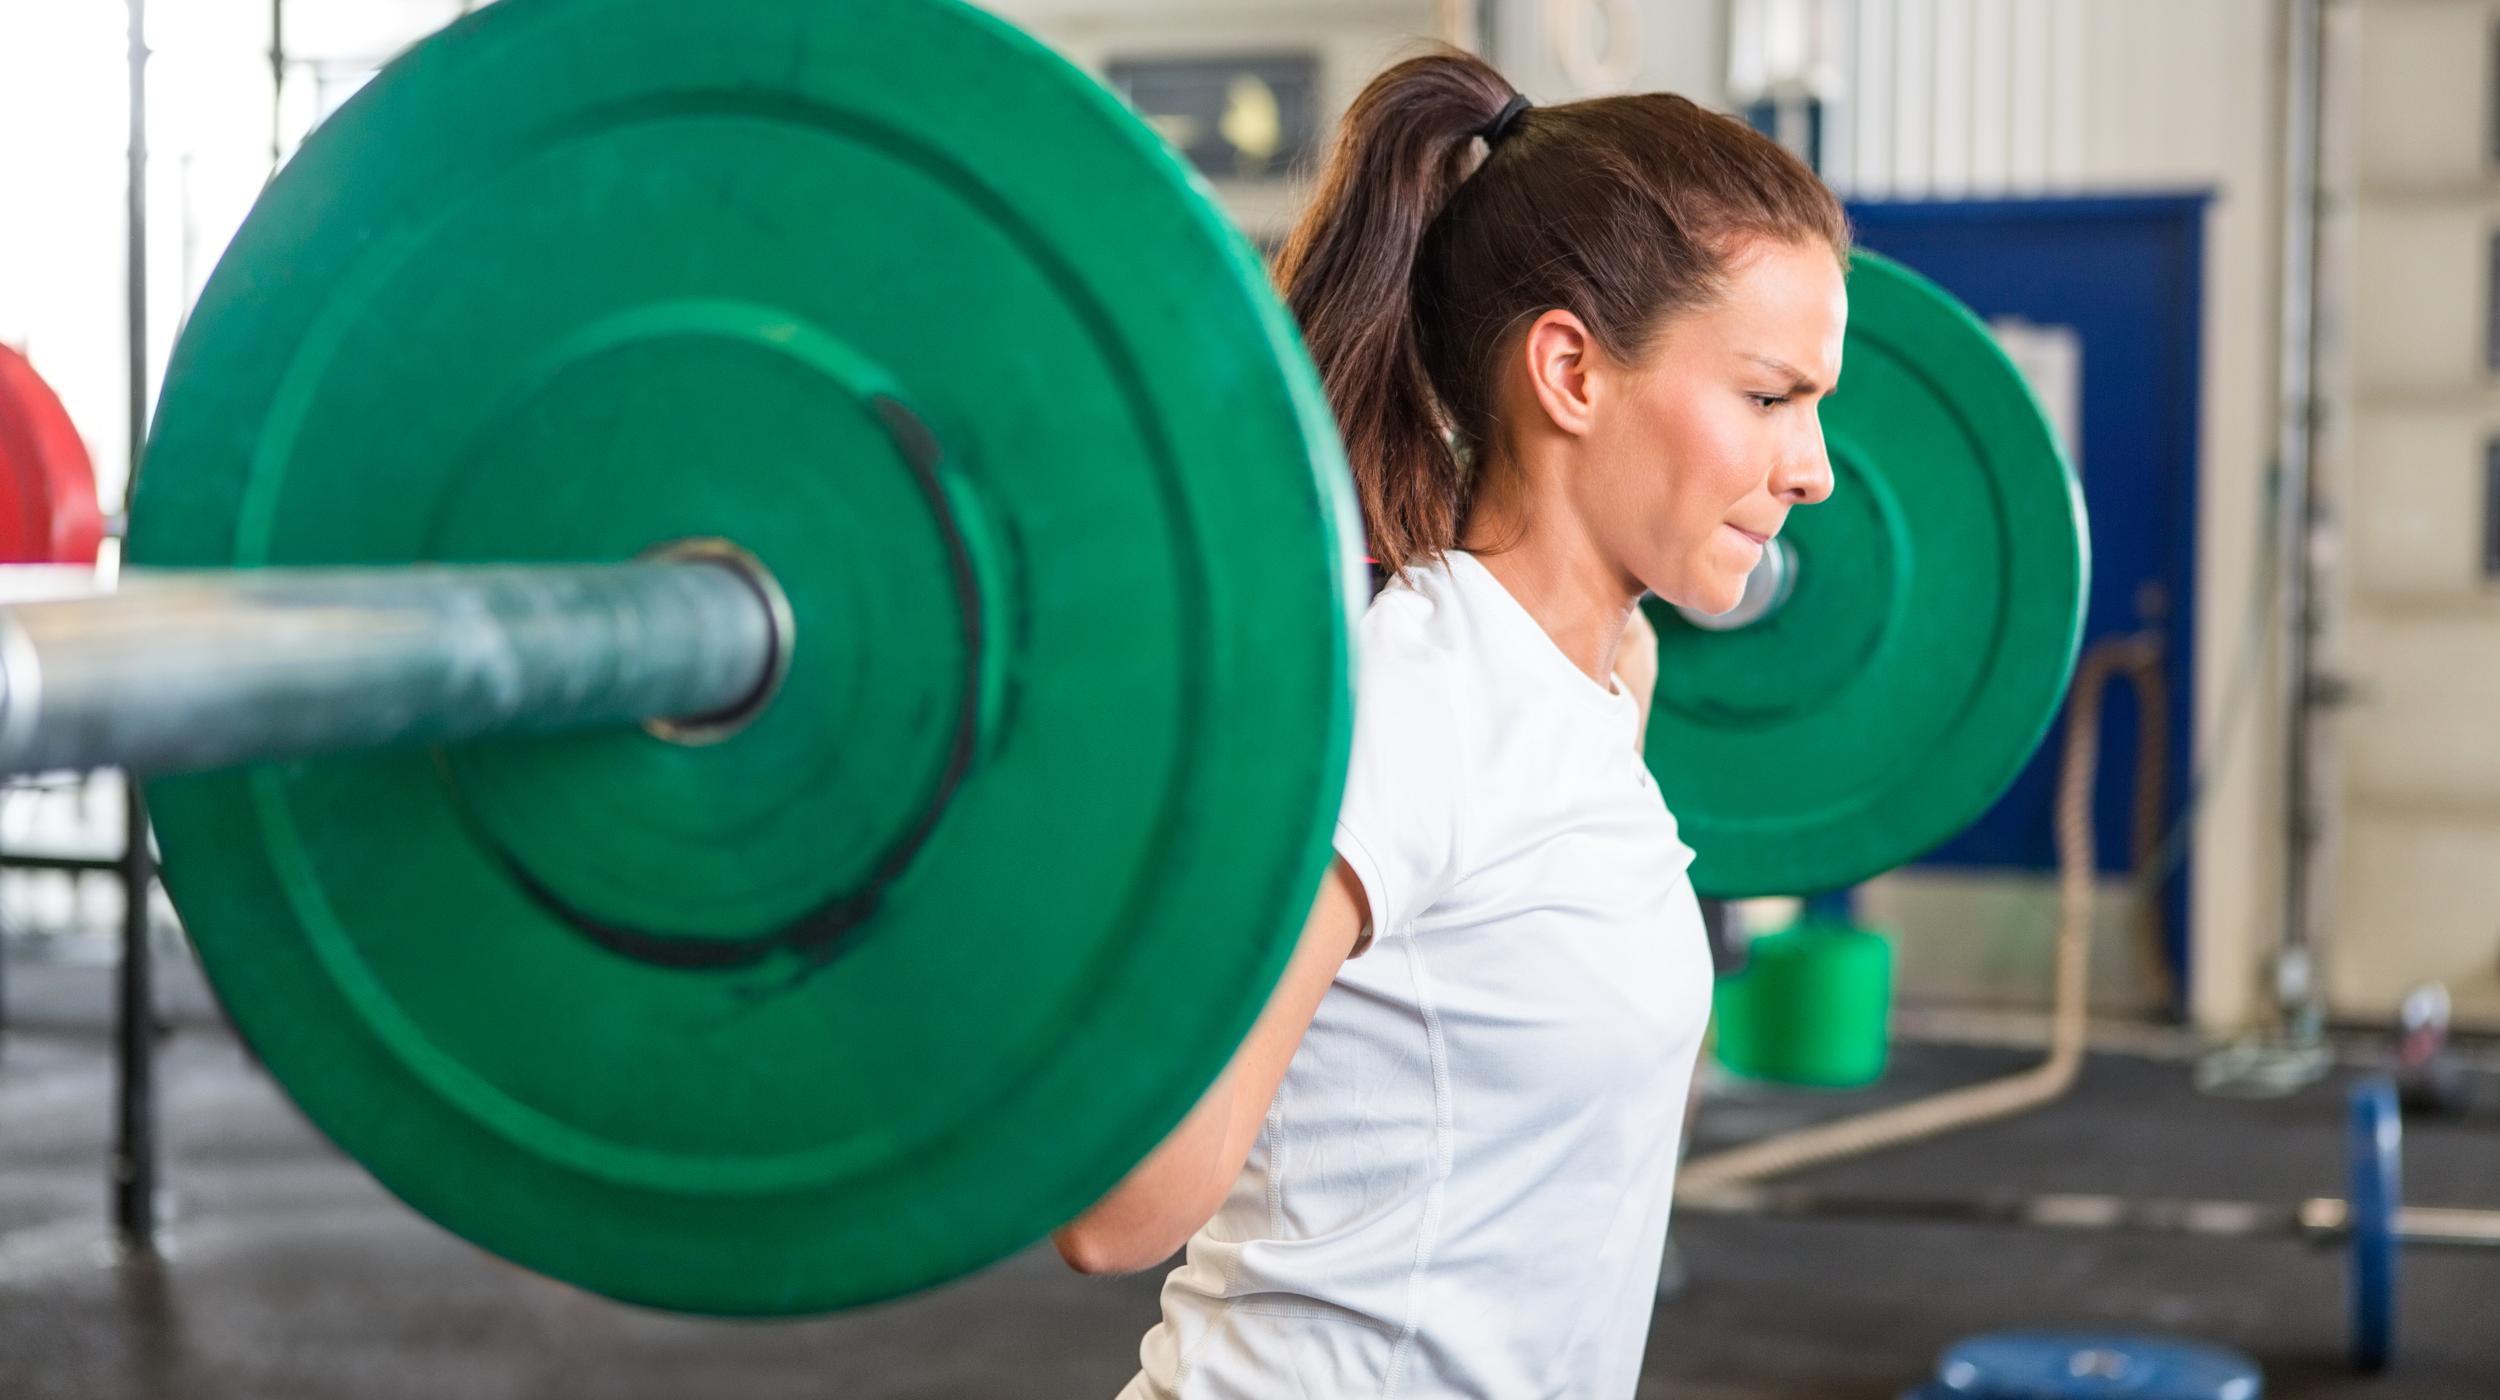 Resistance Training vs. Cardio for Women